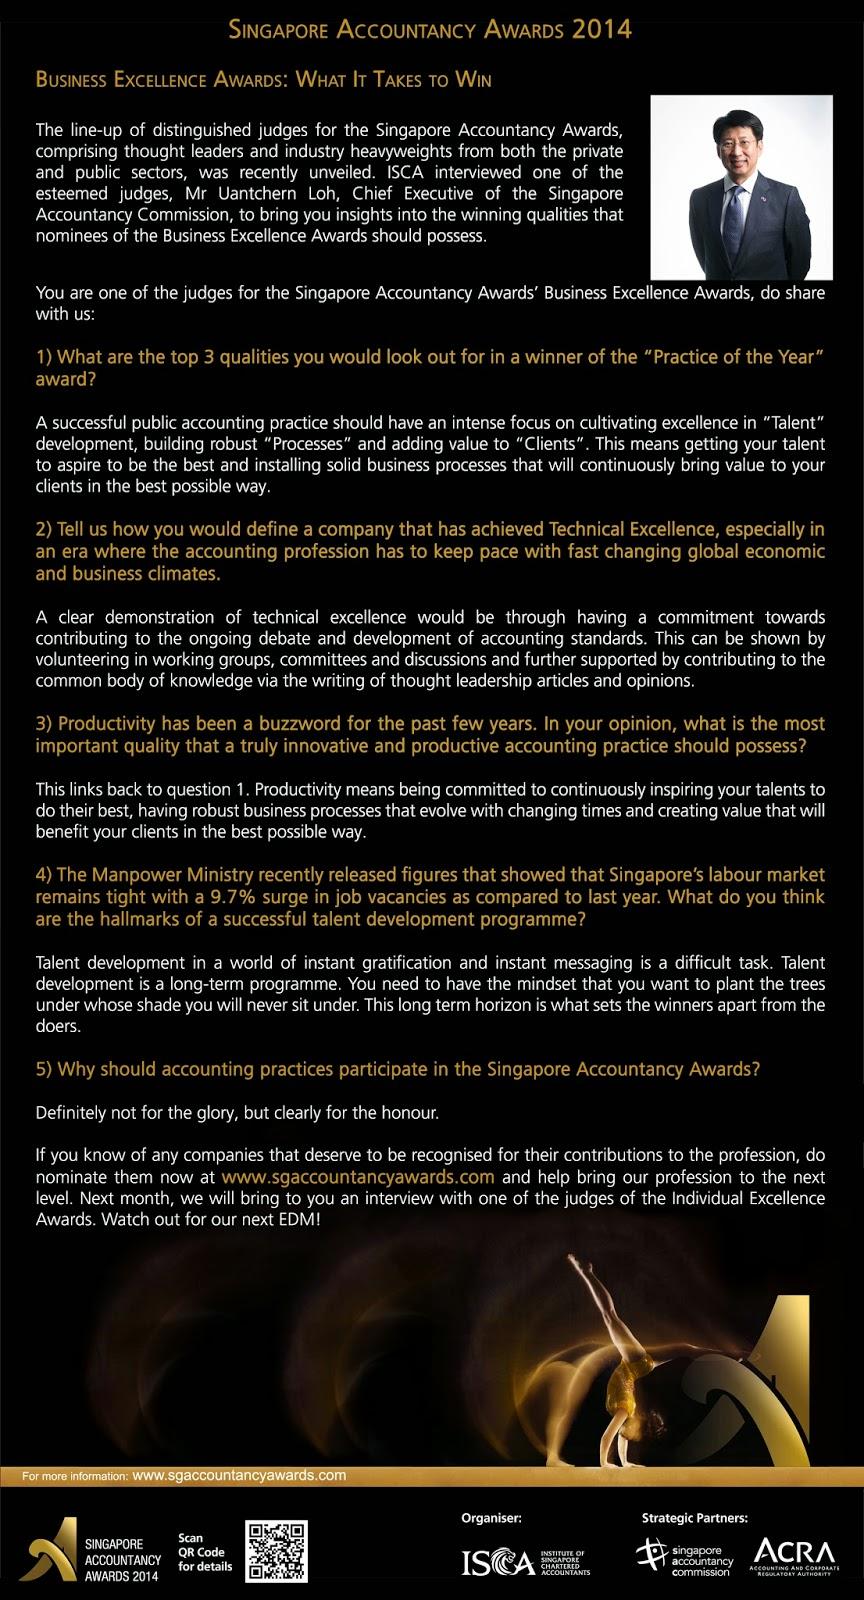 SAA2014 Exclusive Interview with Mr Uantchern Loh